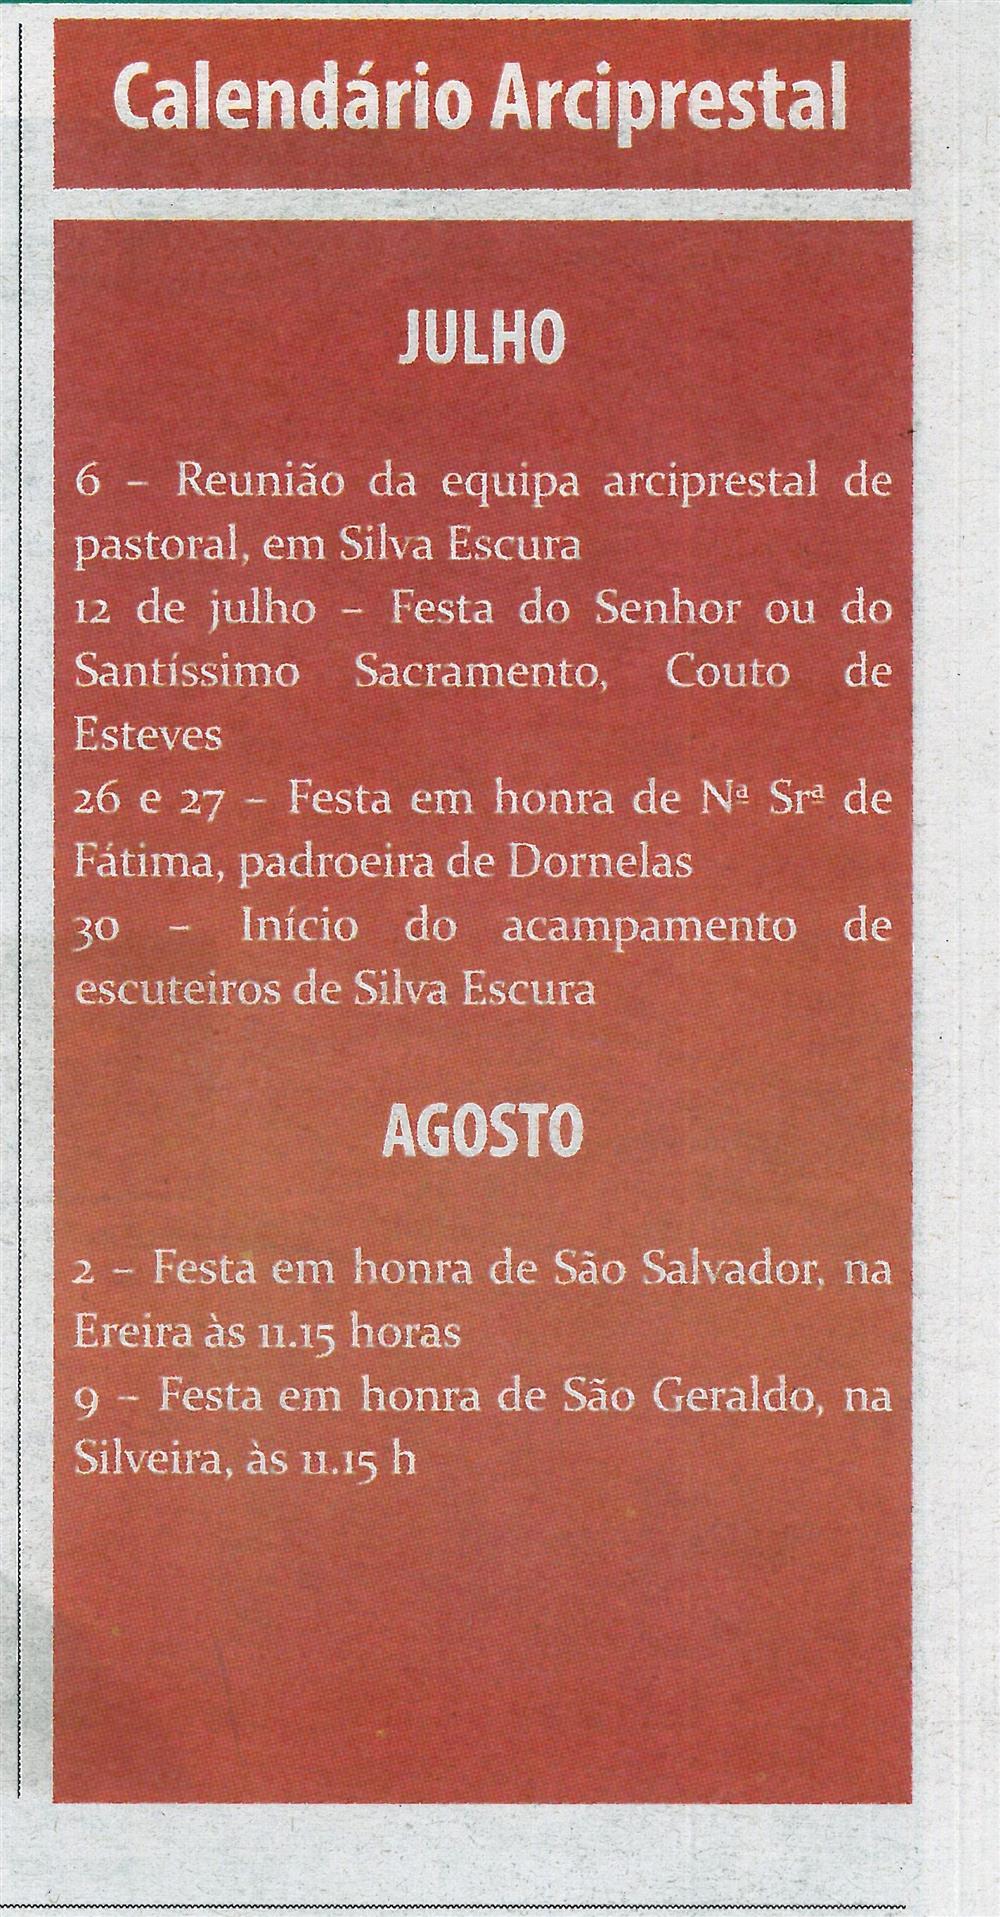 TV-jul.'15-p.16-Calendário arciprestal : julho : agosto.jpg